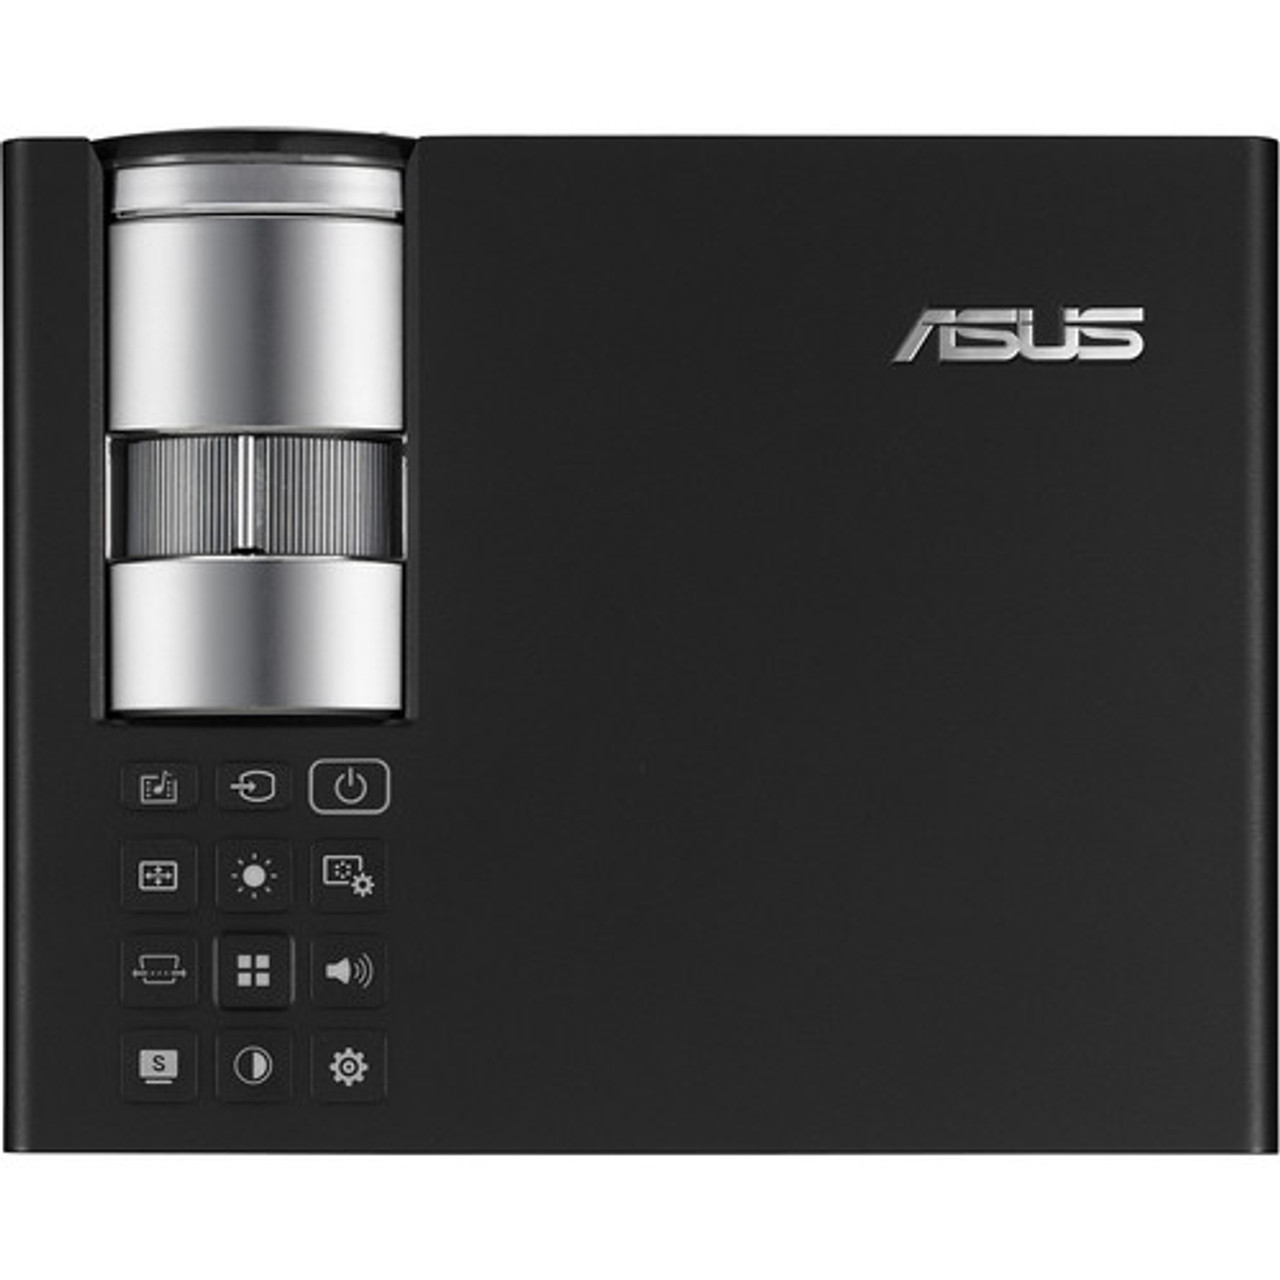 ASUS A90LJ0020-B0104-R B1MR WXGA Portable LED Projector - Certified Refurbished